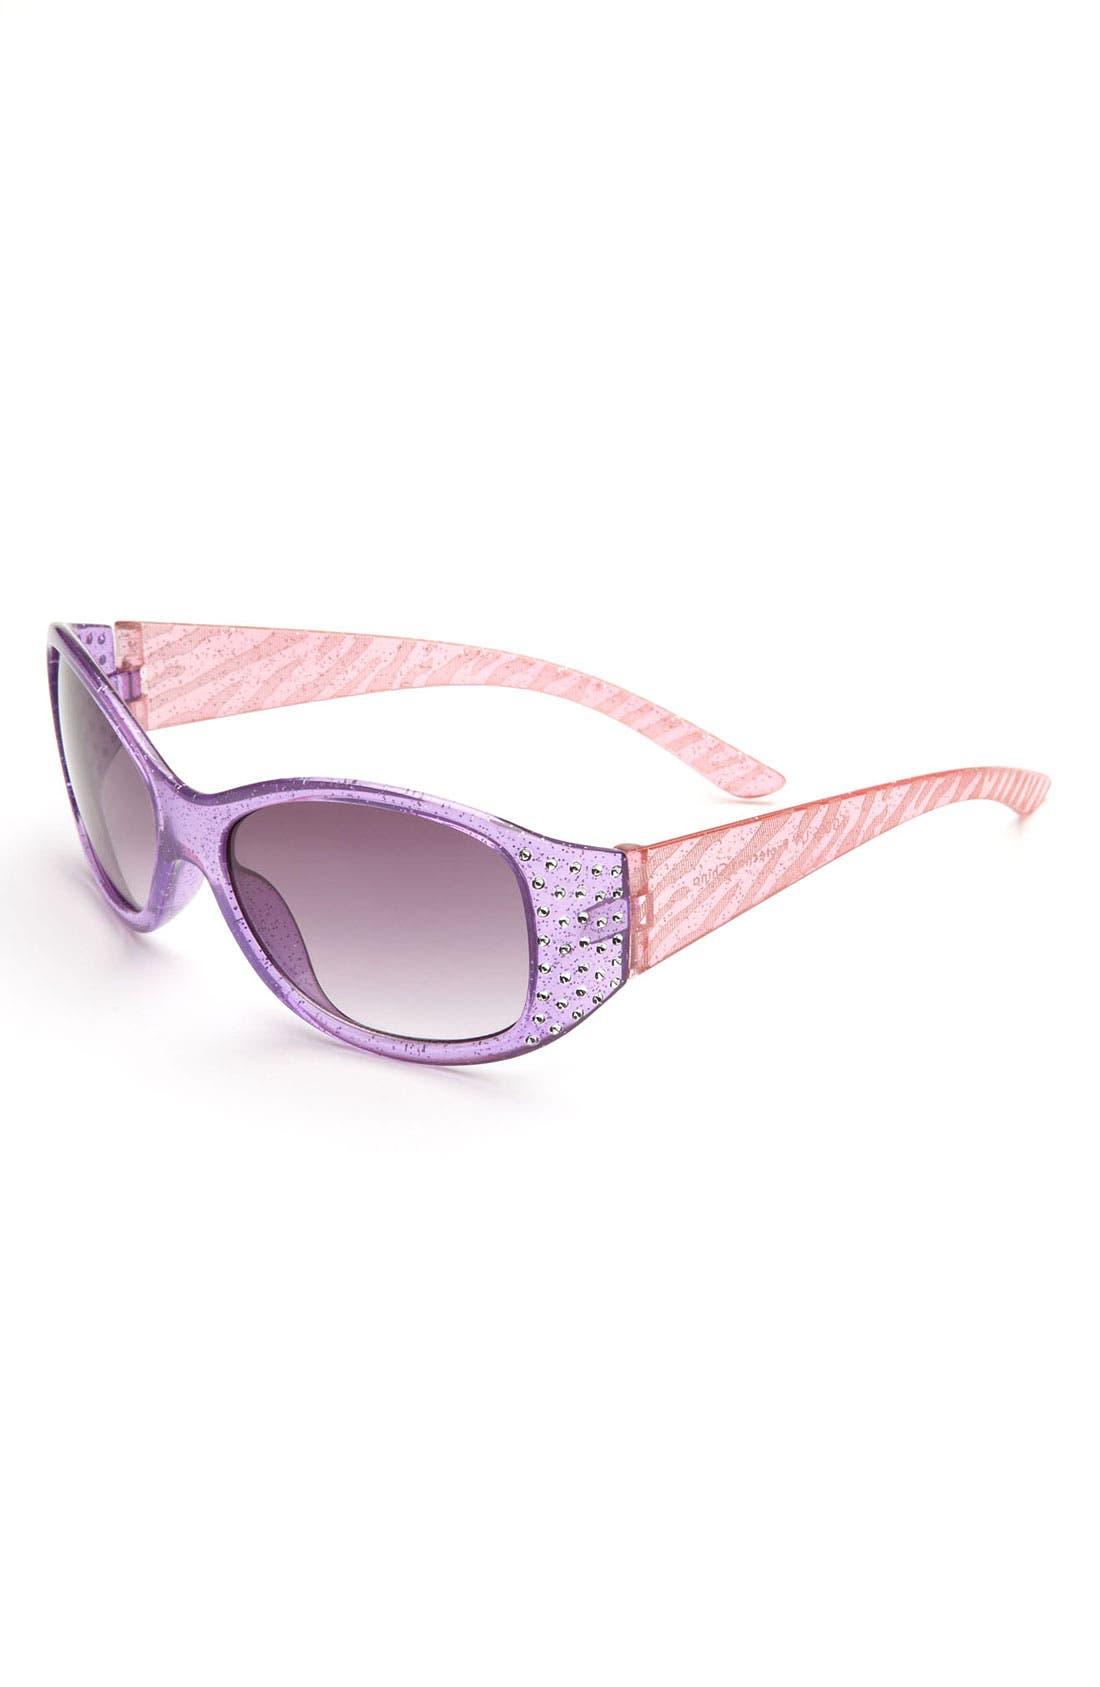 Main Image - Fantas Eyes Sunglasses (Girls)